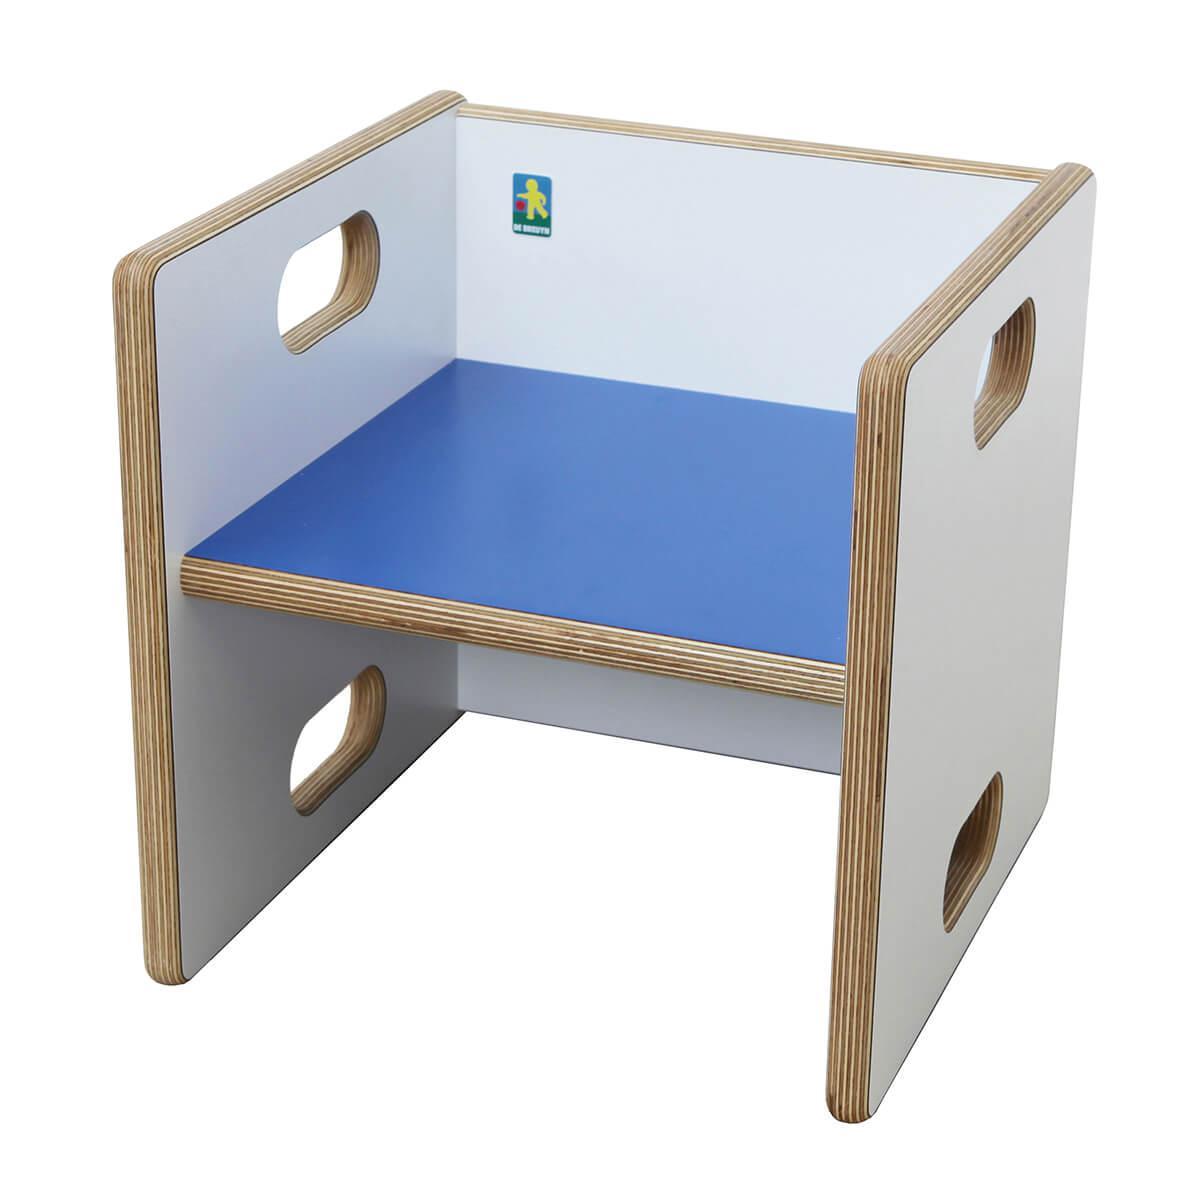 Chaise évolutive Ziggy de Breuyn blanc - bleu foncé